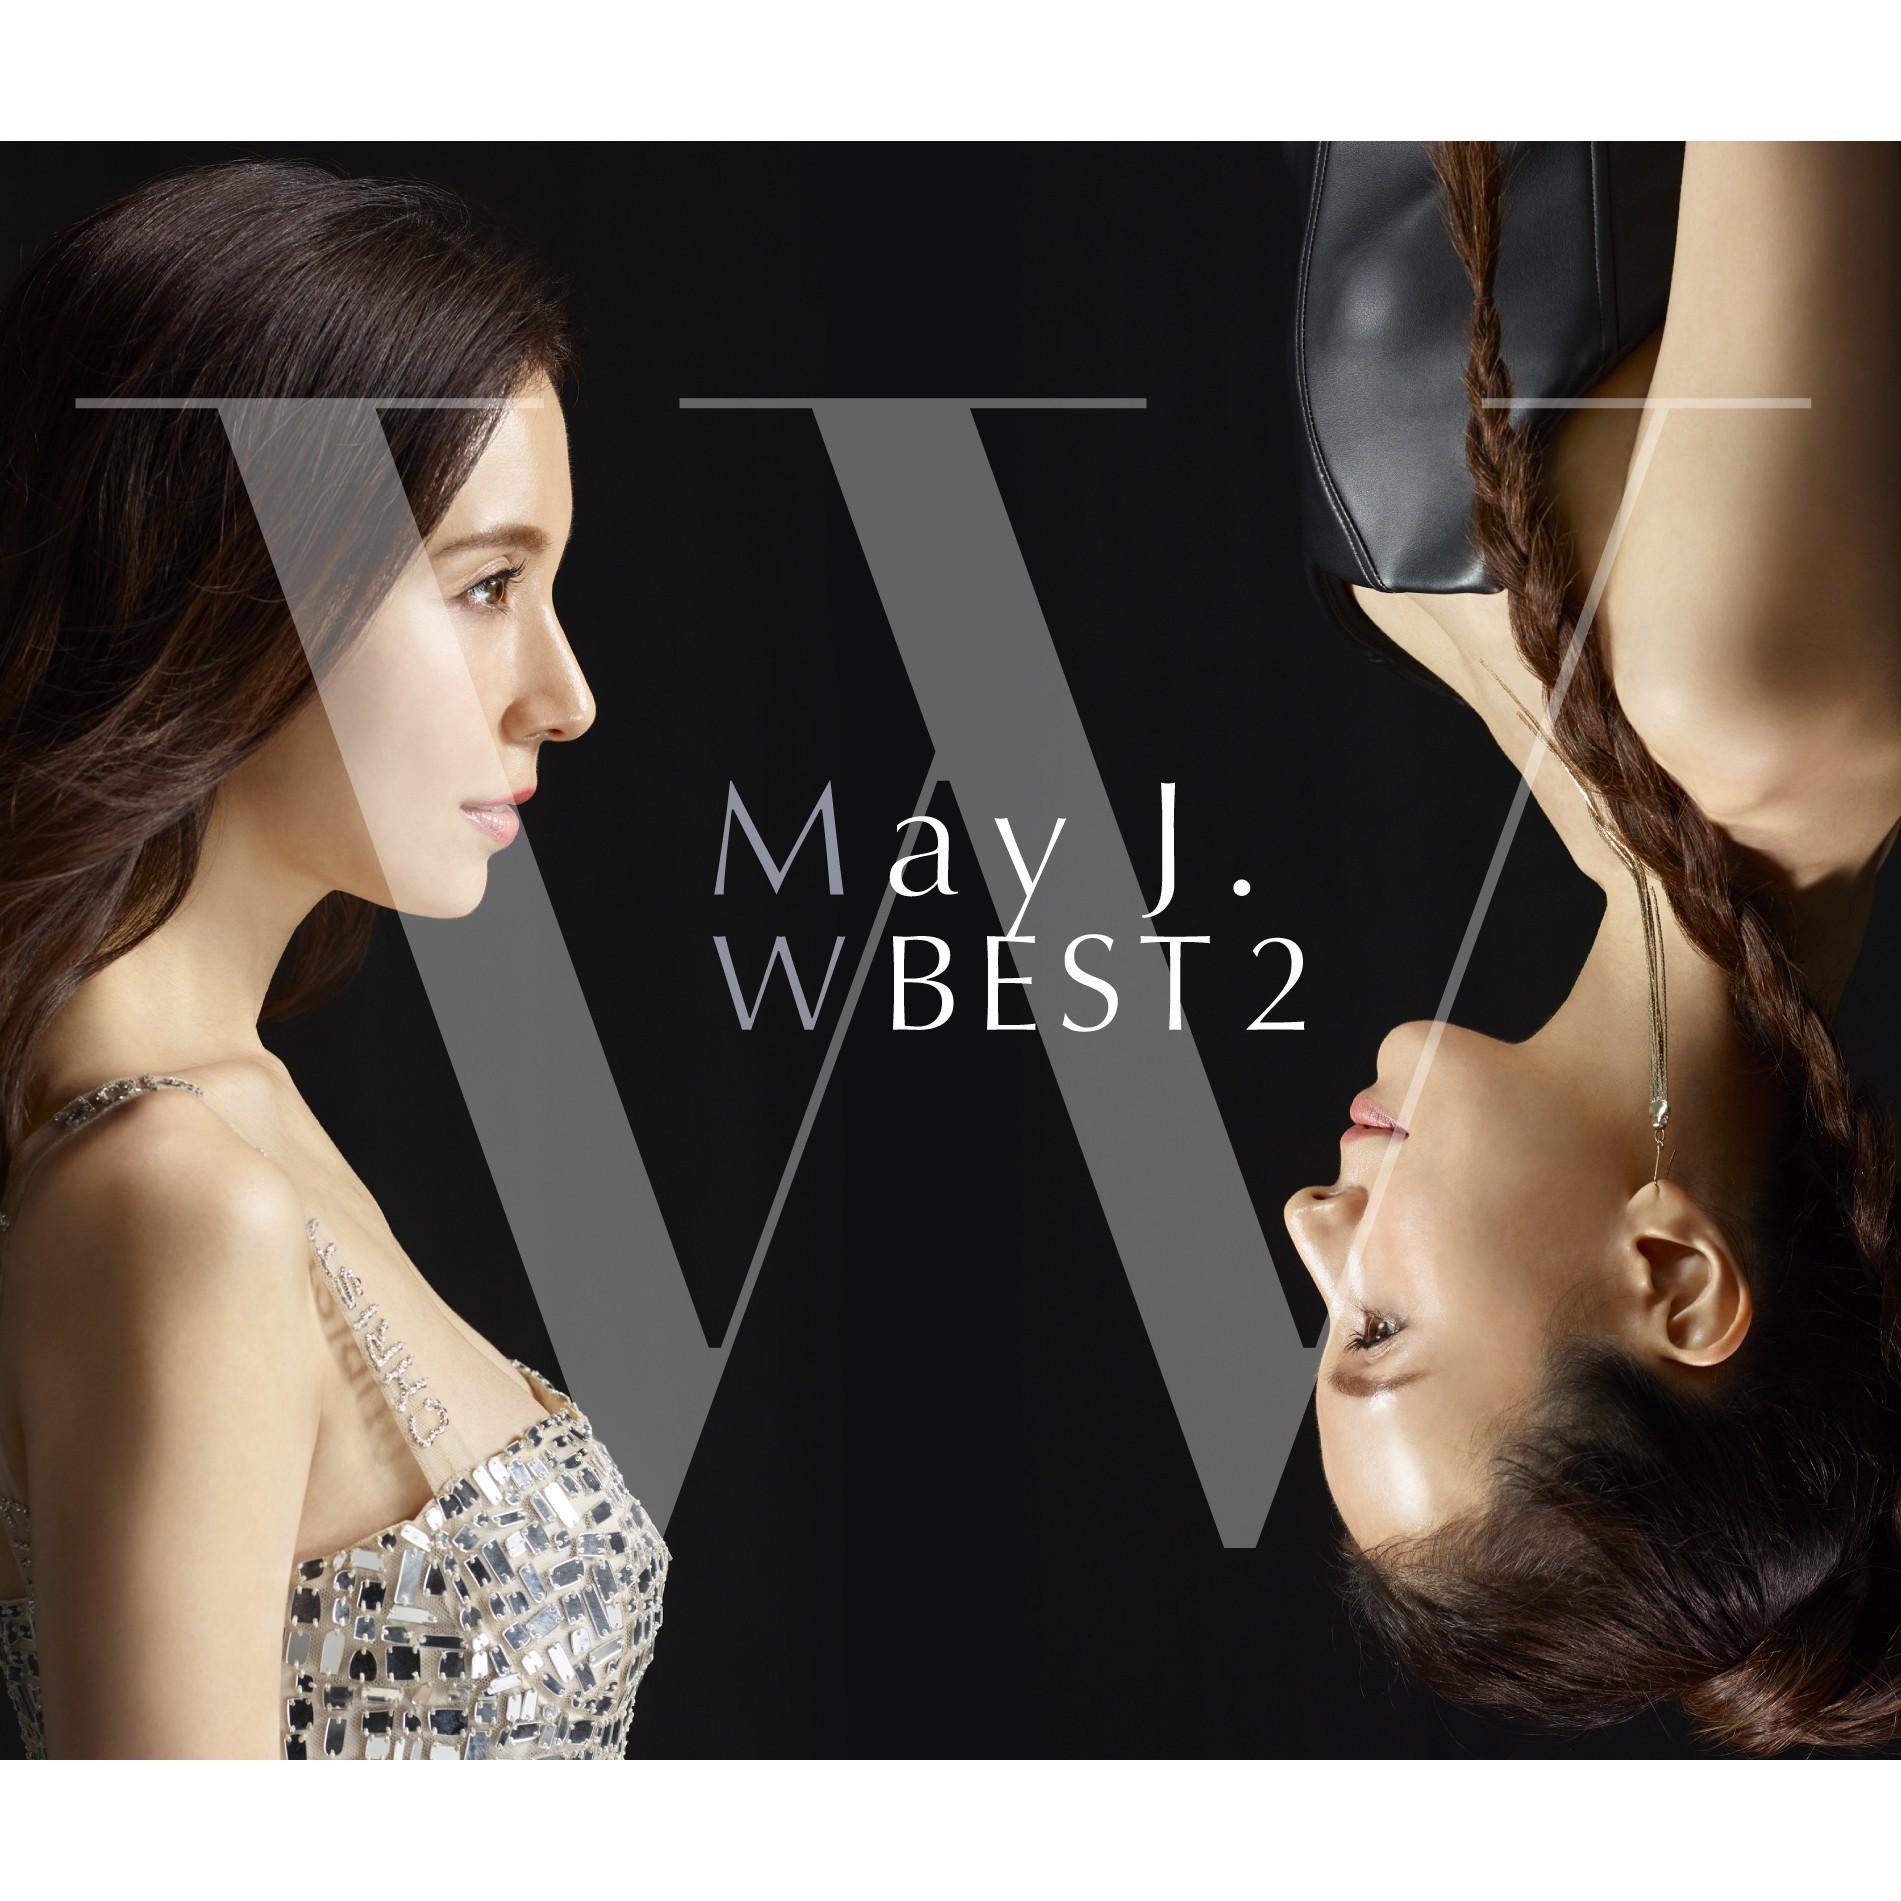 [Album] May J. – May J. W BEST 2 -Original & Covers- [FLAC / 24bit Lossless / WEB] [2020.12.24]